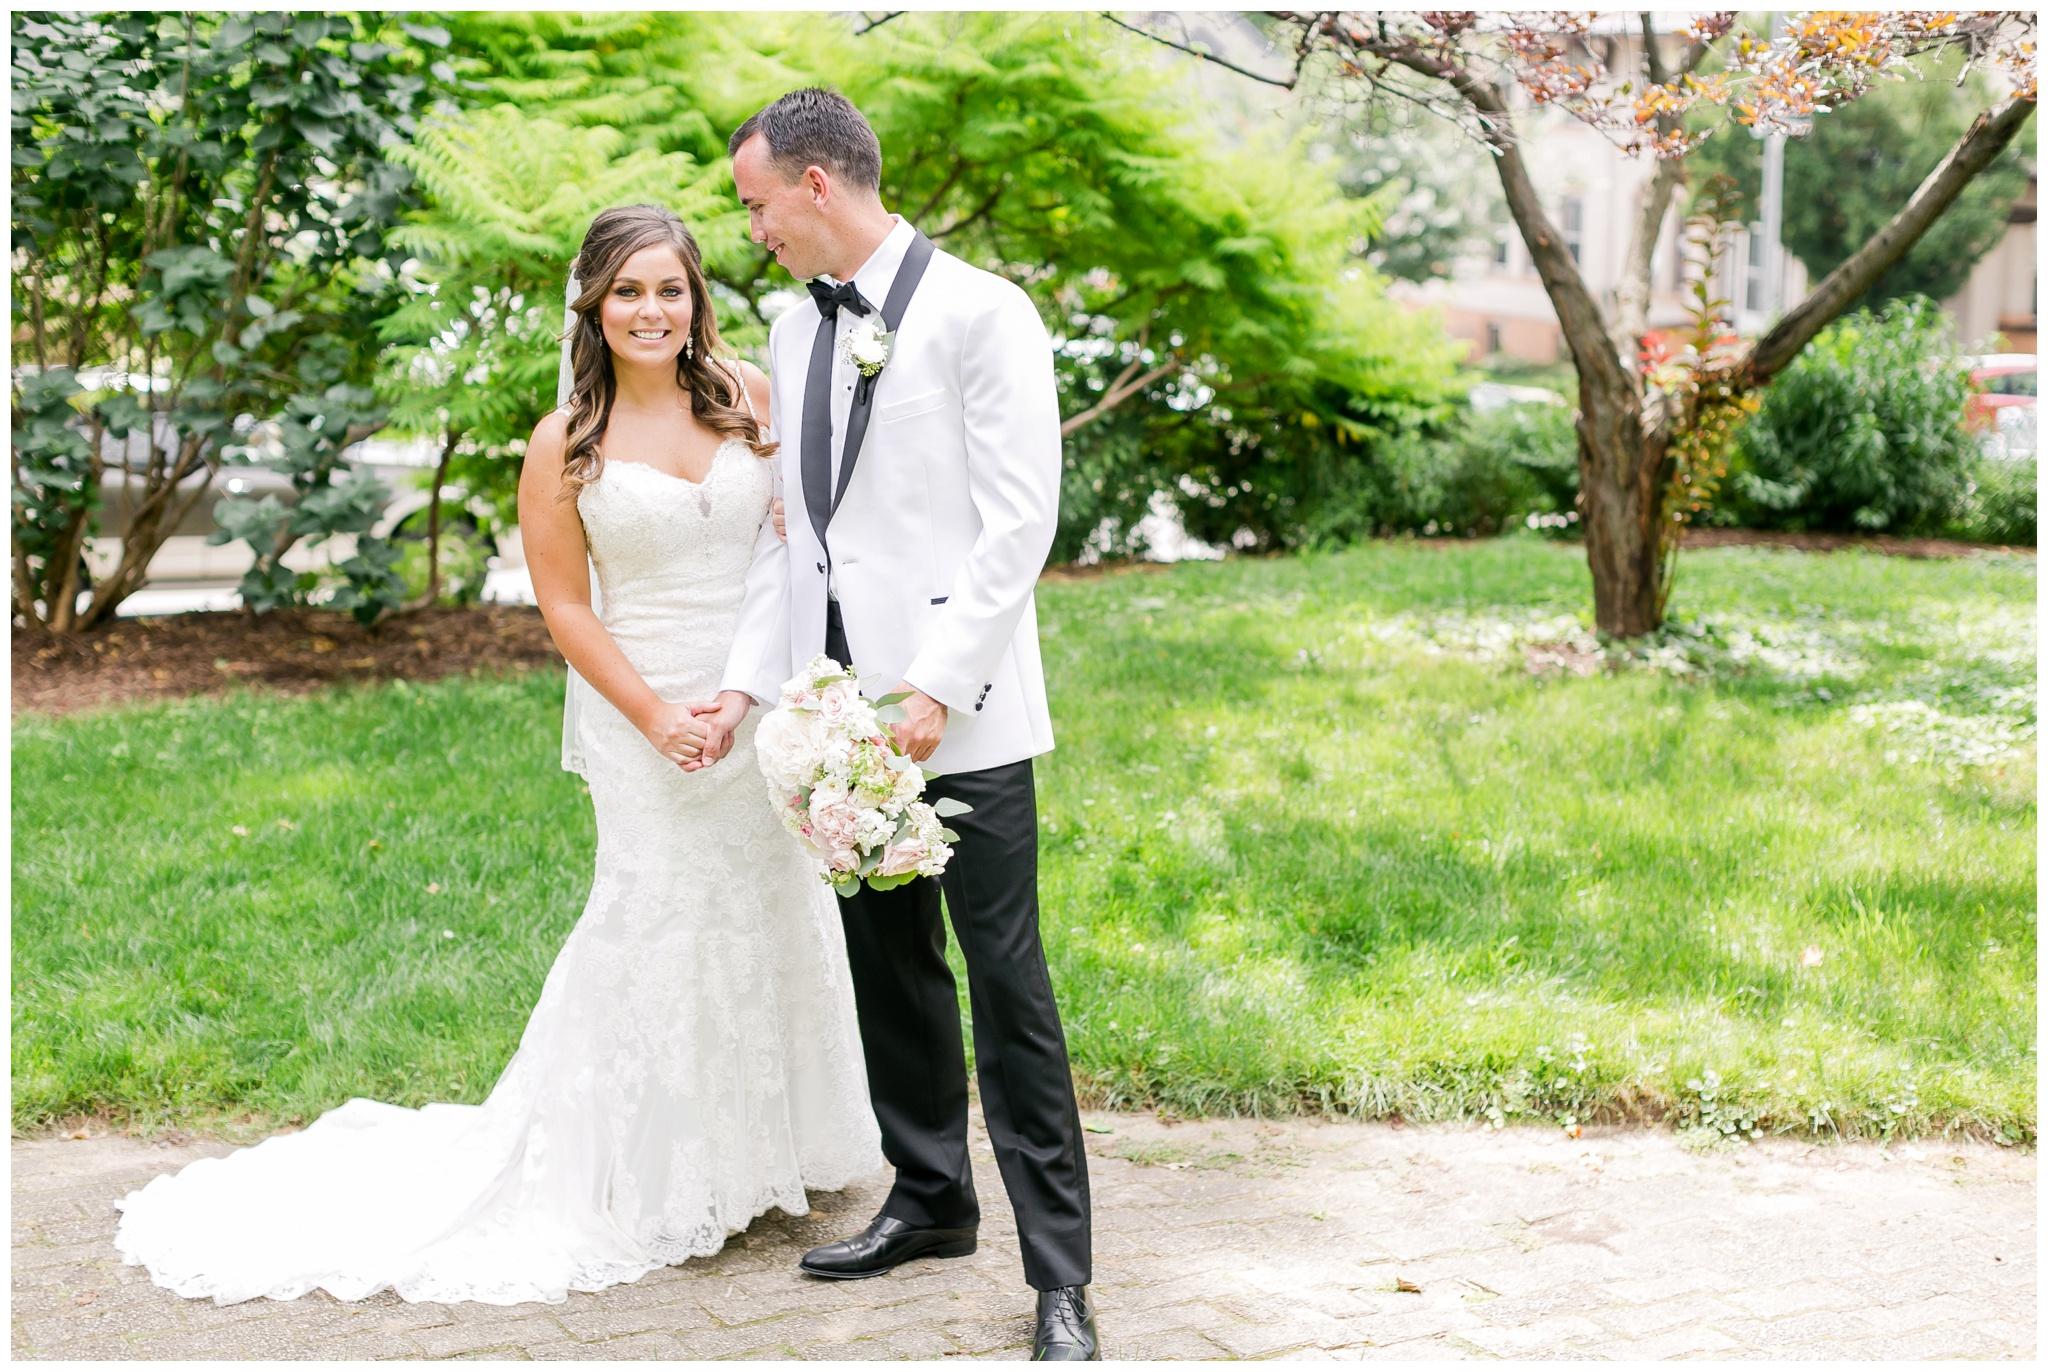 UW_Memorial_Union_wedding_madison_wisconsin_wedding_photographers_4602.jpg